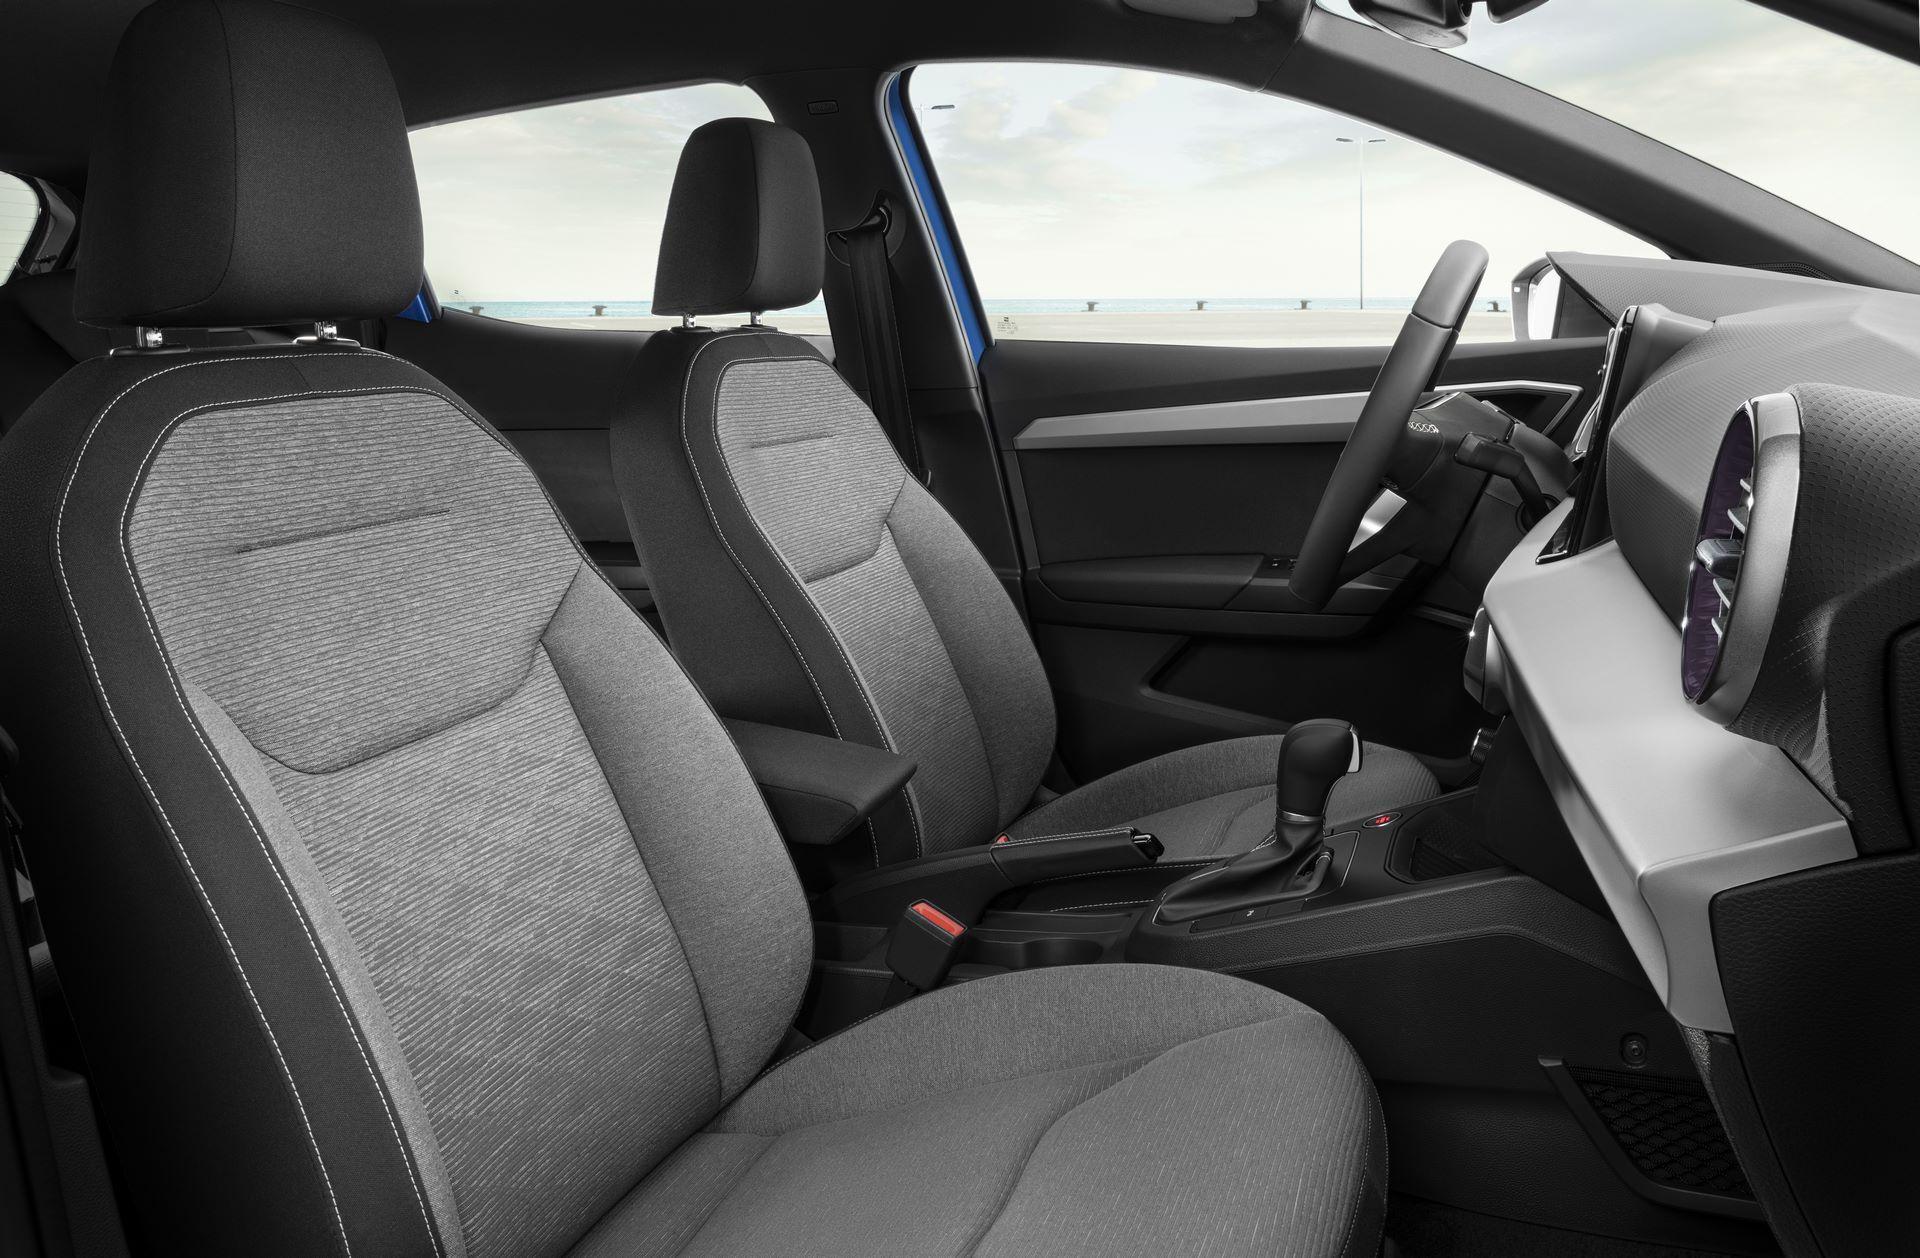 SEAT-Ibiza-Xcellence_17_HQ